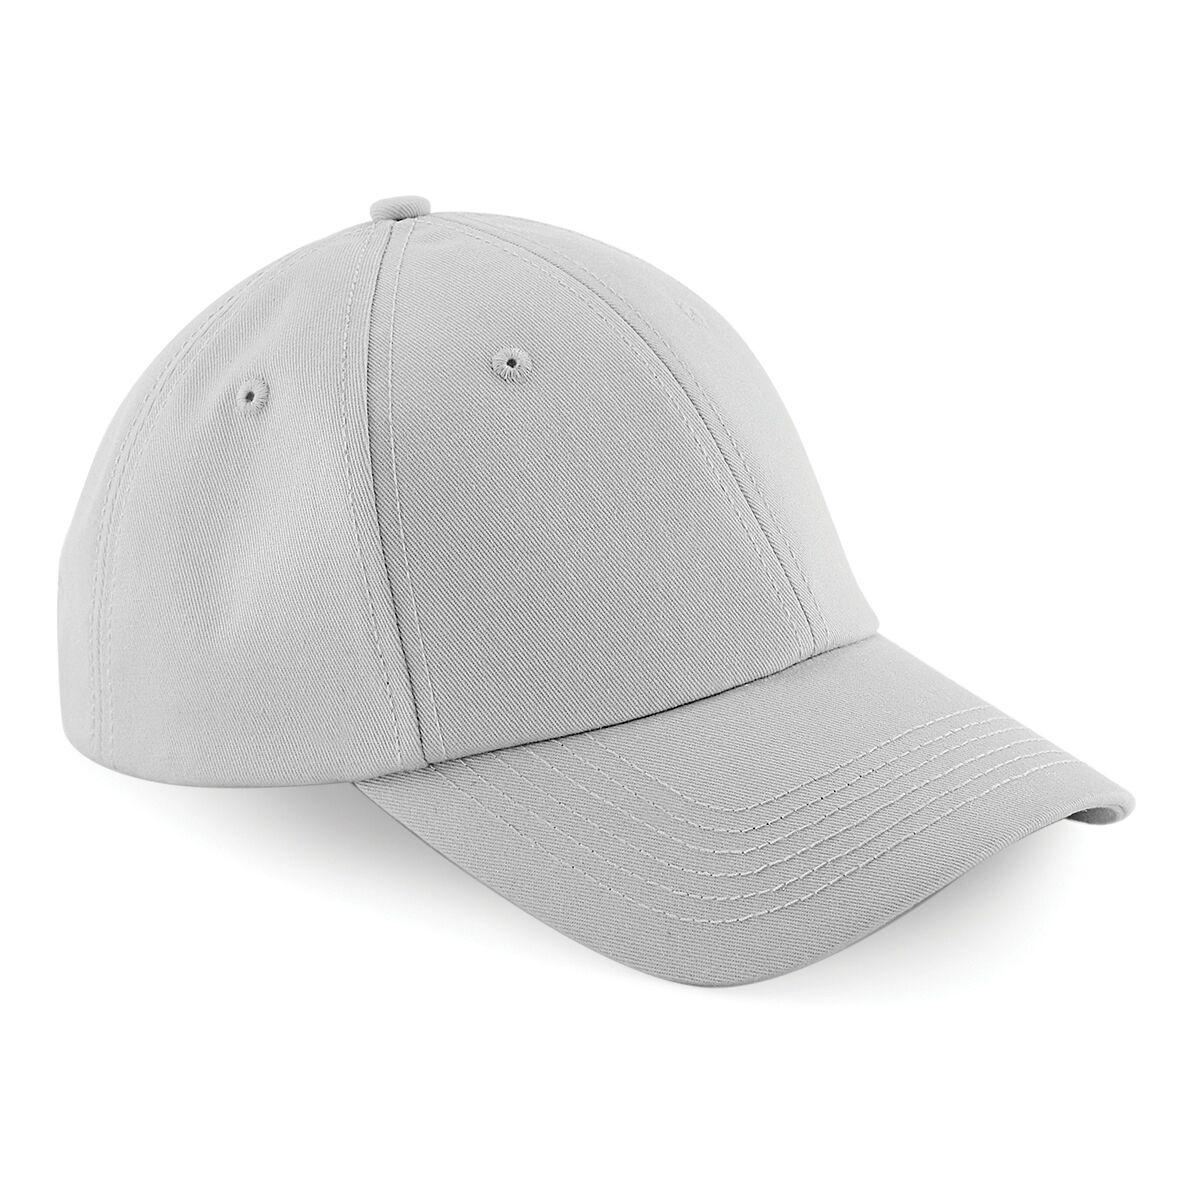 Unisex Beechfield Cotton Twill Tri-glide Buckle Authentic Baseball Cap One Size